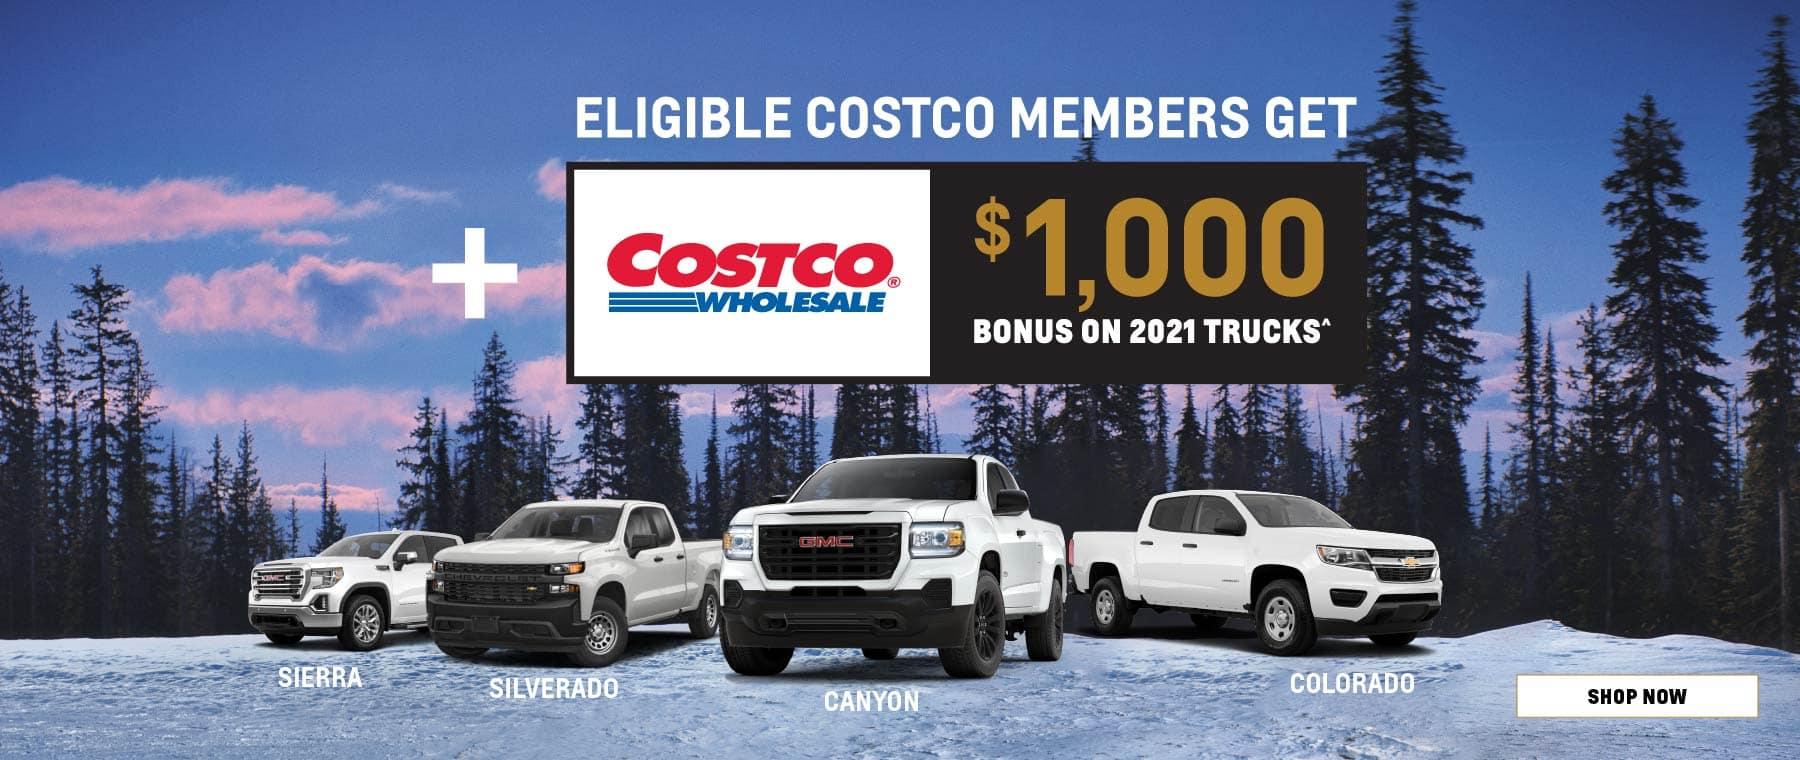 Eligible Costco Members get $1000 Bonus on 2021 Trucks